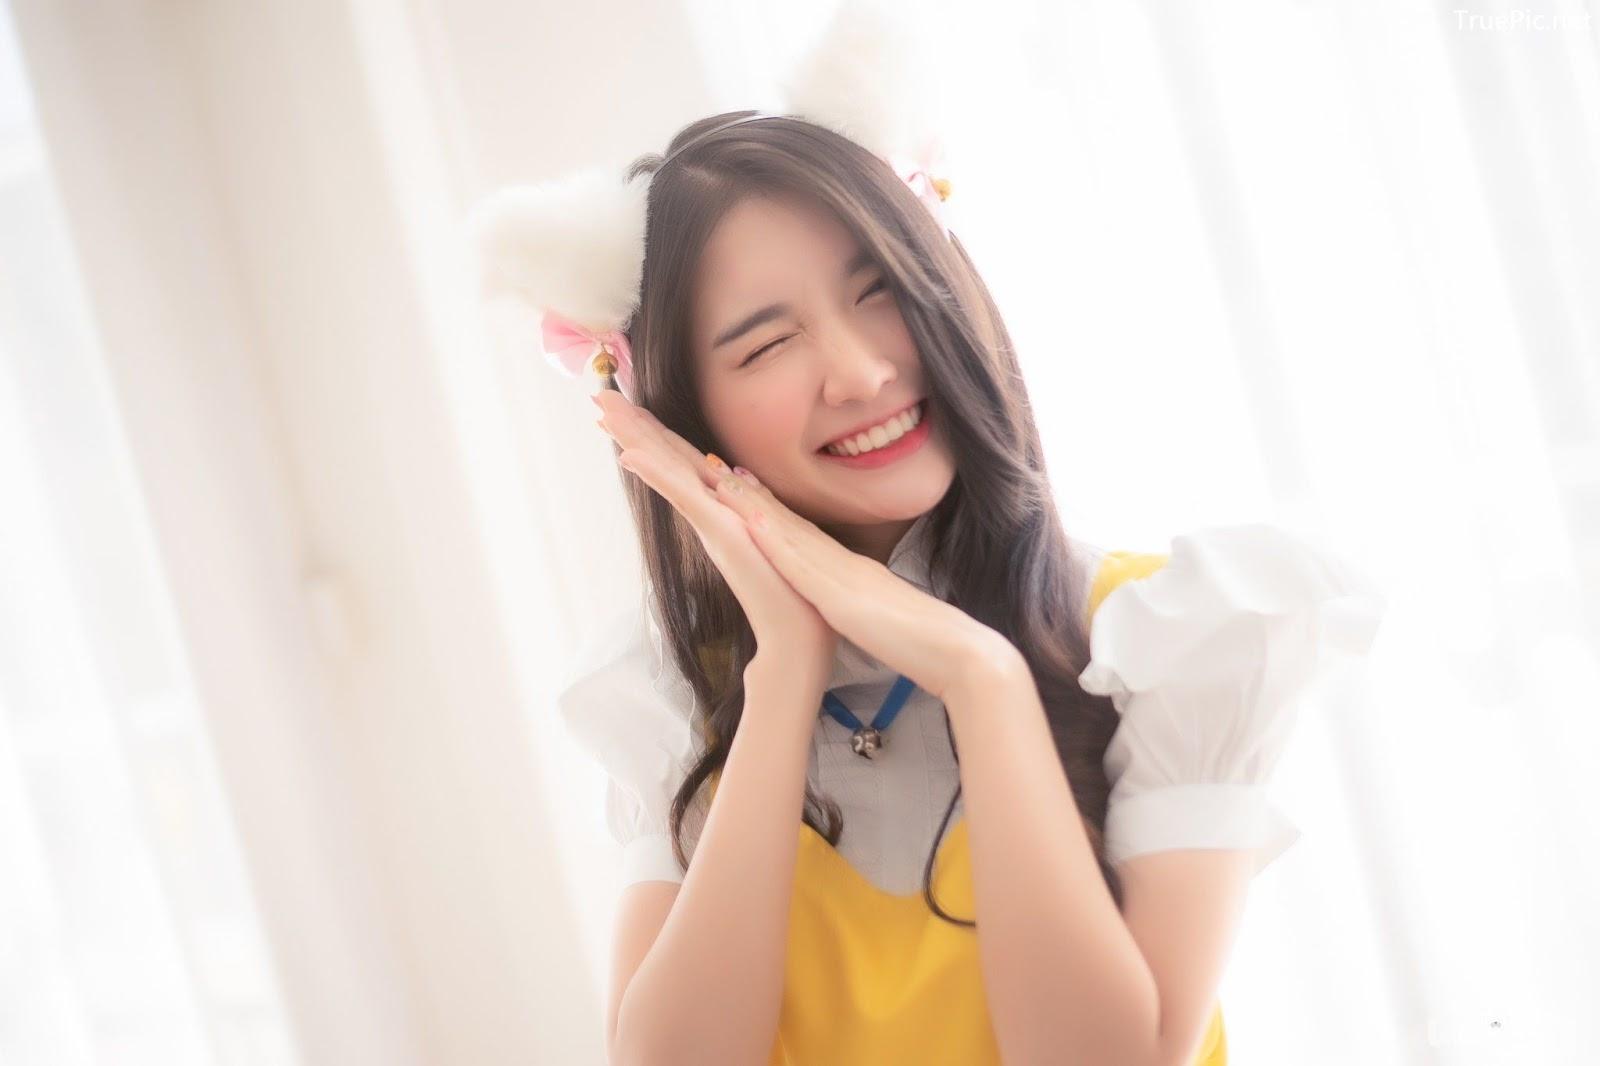 Image Thailand Model - Yatawee Limsiripothong - Cute Maid - TruePic.net - Picture-5